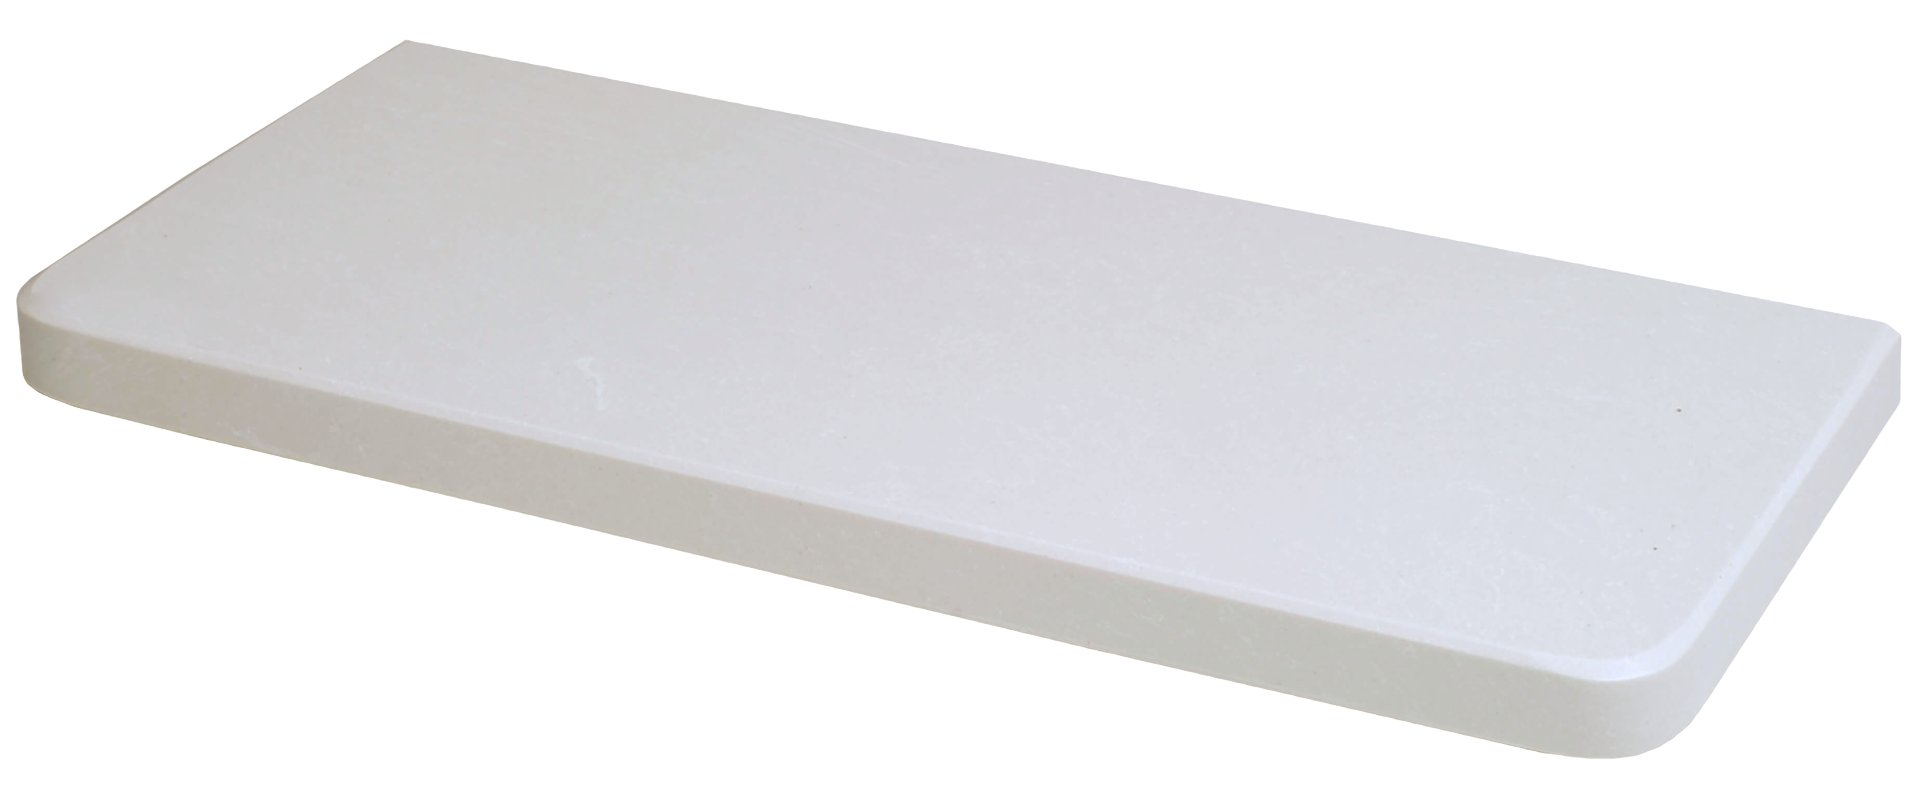 Parapet Aglomarmur Konglomerat White Pearl 7171581297 Oficjalne